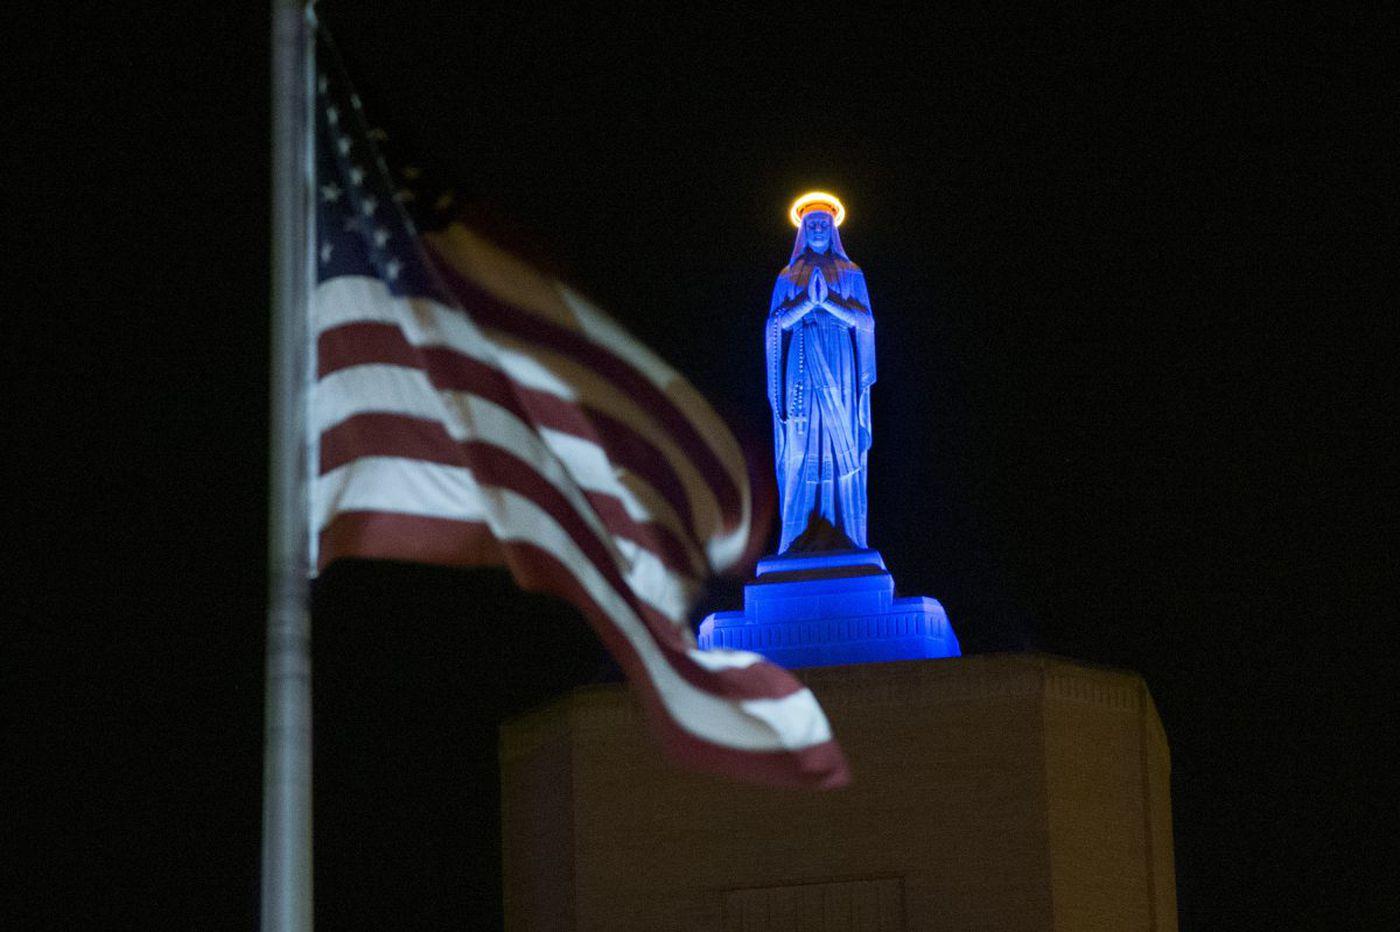 Cooper calls off deal for Lourdes, St. Francis